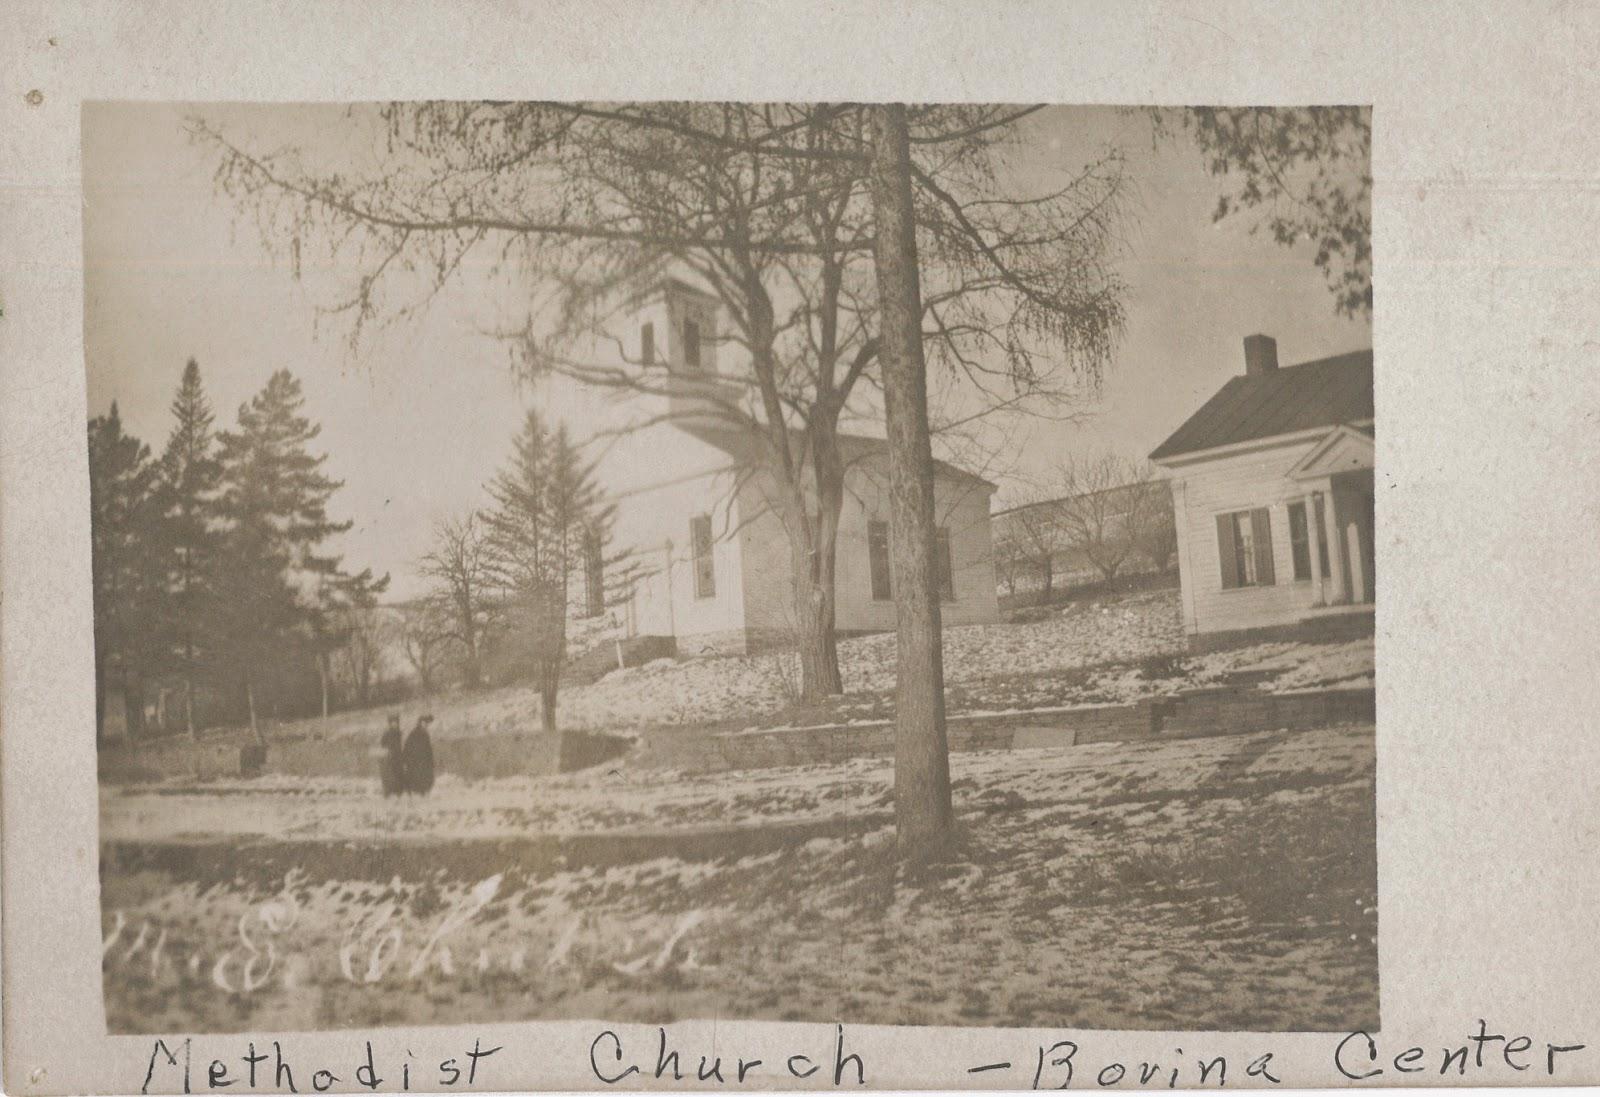 history of methodist church pdf